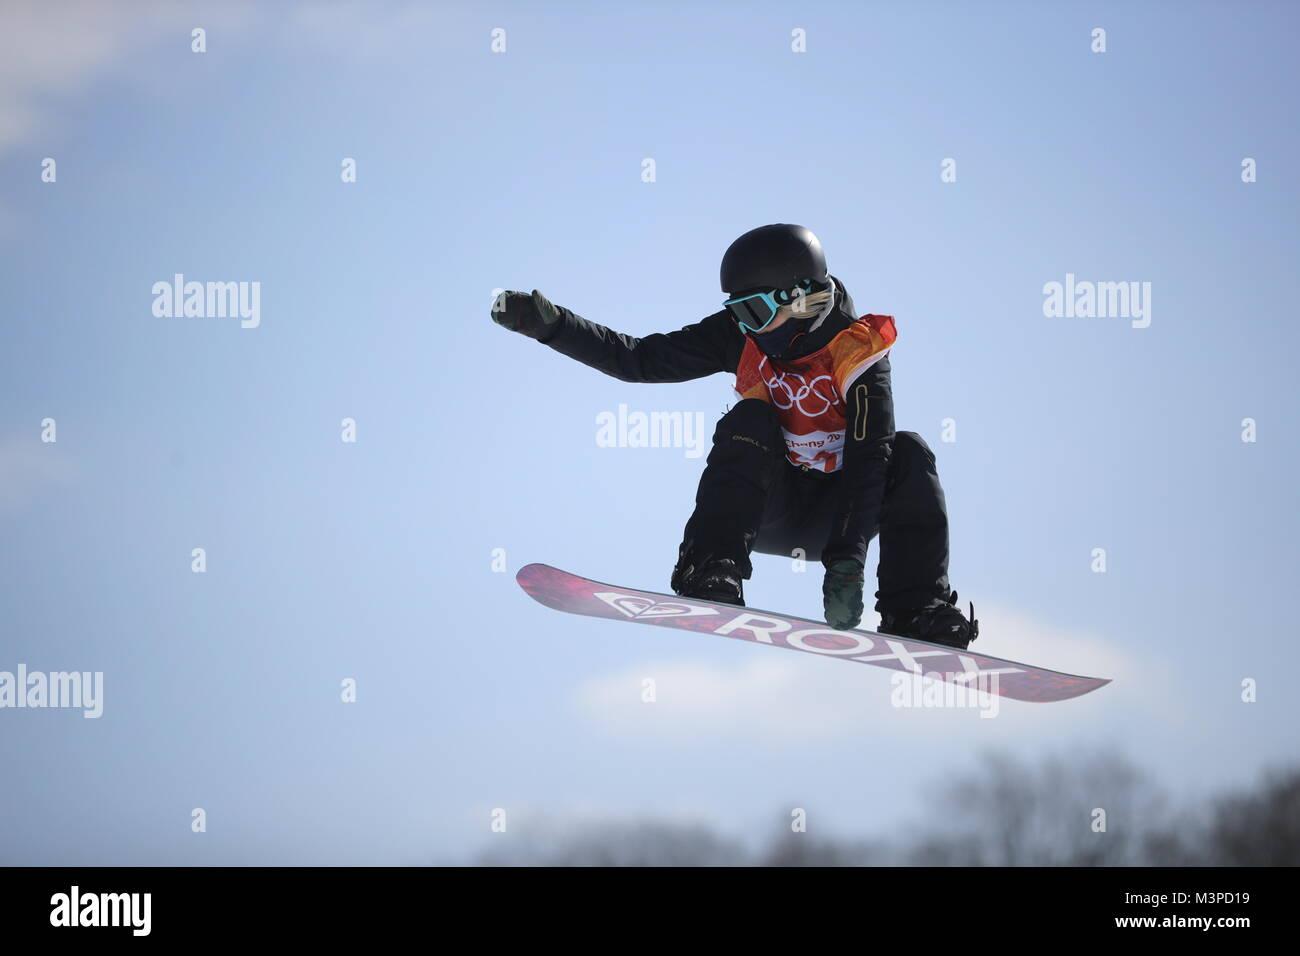 Pyeongchang, South Korea. 12th Feb, 2018. PYEONGCHANG, SOUTH KOREA - FEBRUARY 11, 2018: Snowboarder Sofya Fyodorova, - Stock Image